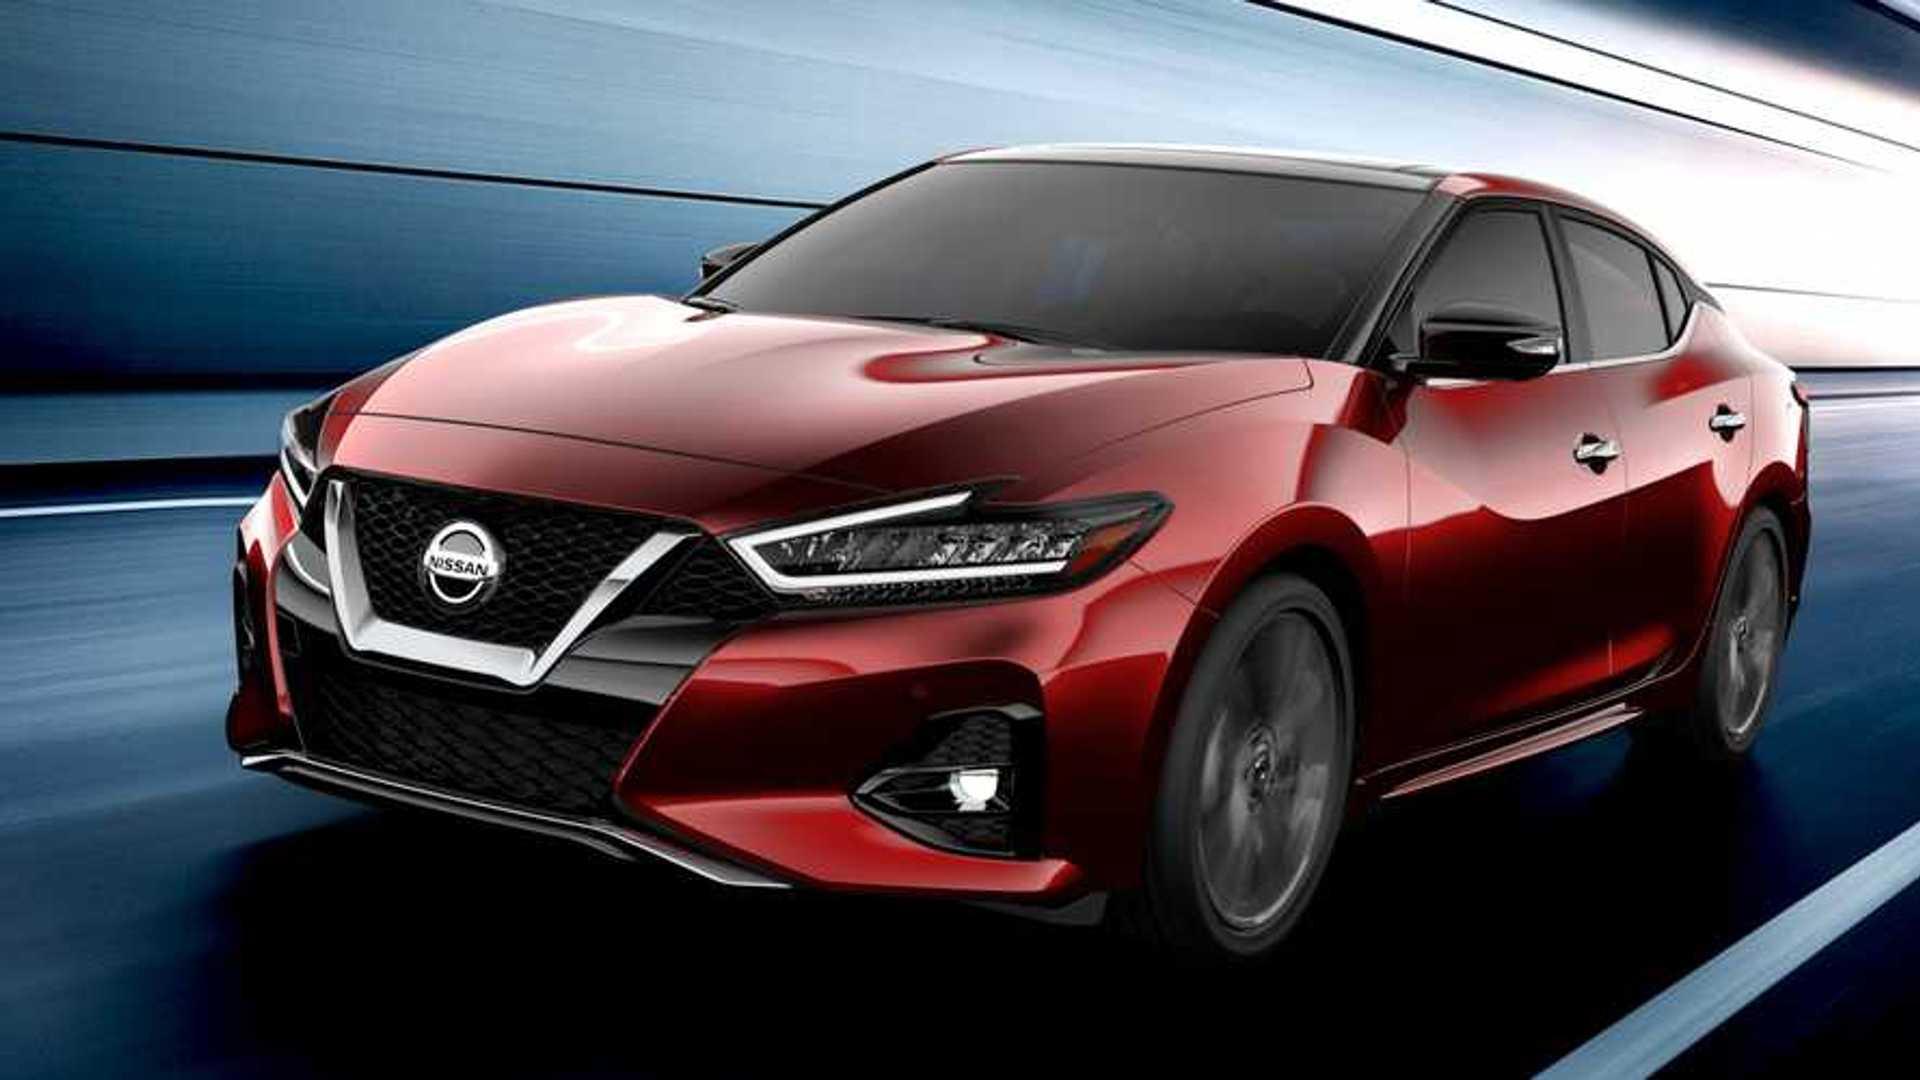 New Nissan Maxima >> 2019 Nissan Maxima Will Show Its Fresh Face At La Auto Show